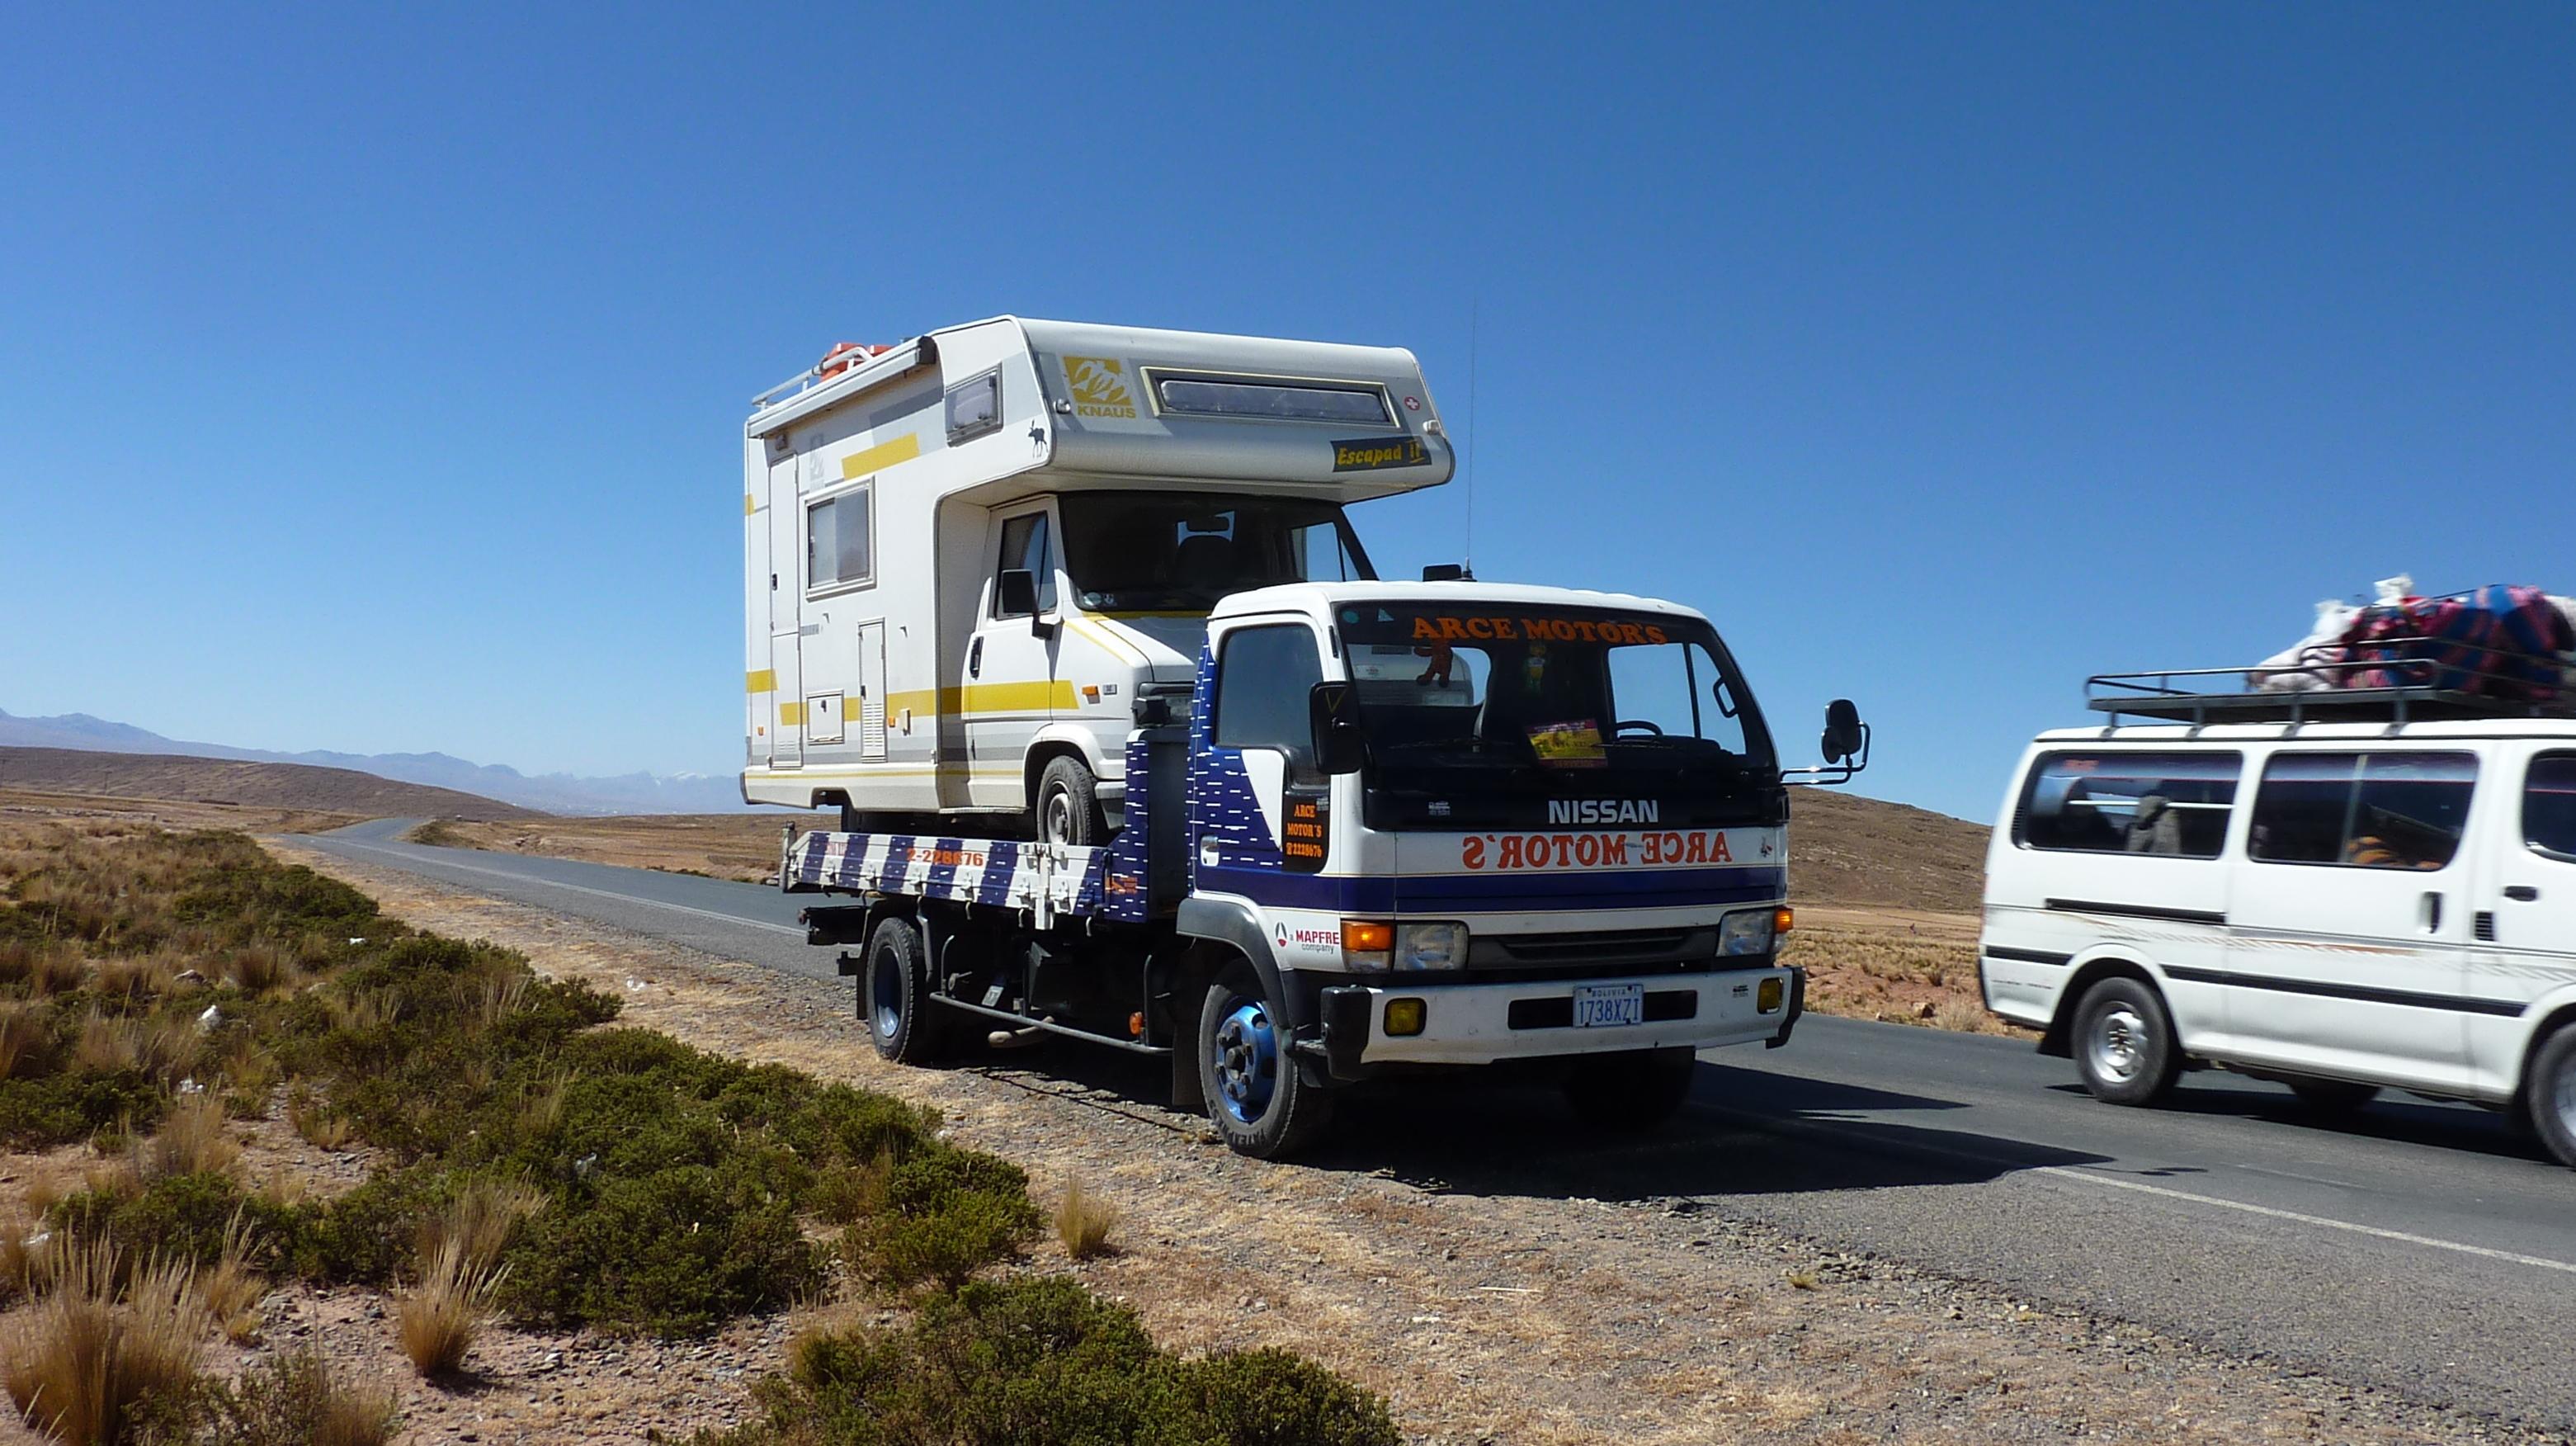 Abtransport Camper in La Paz 2009-07-02_13-17-56